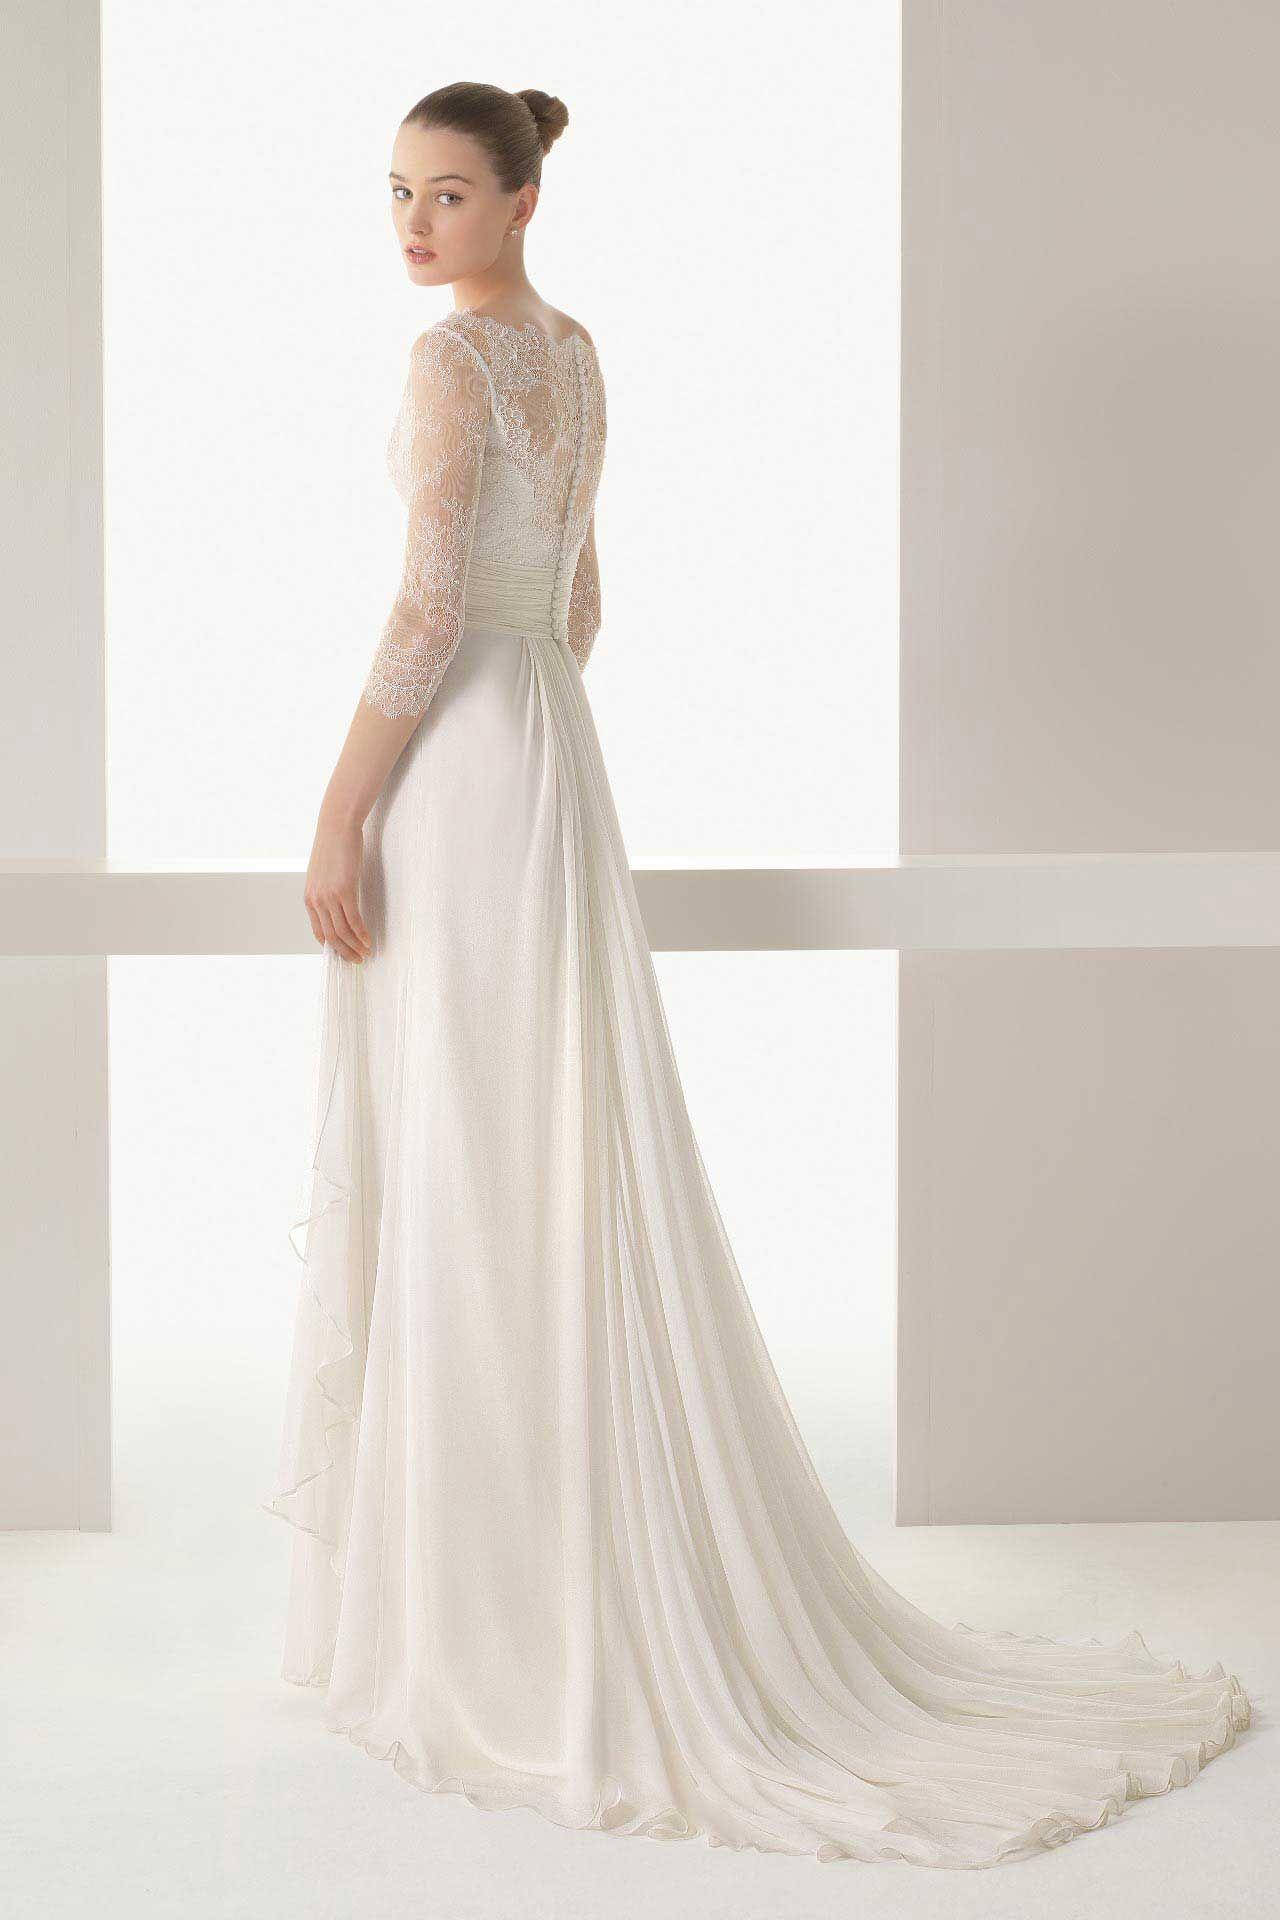 Lace Wedding Dress Vintage Wedding Dresses Portlandthe White Dress